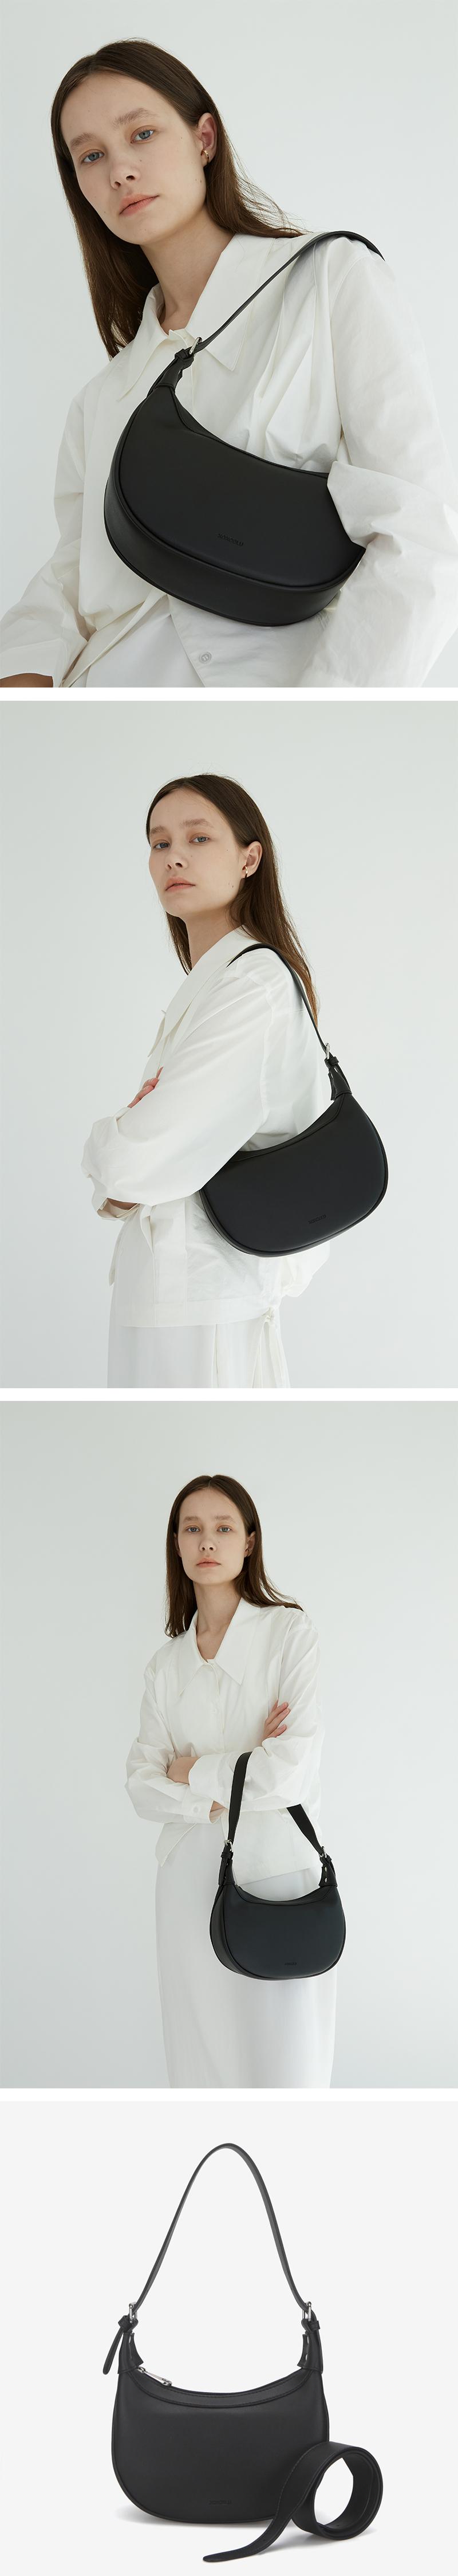 XOXO BLU 숄더겸 크로스백 UPSH002A